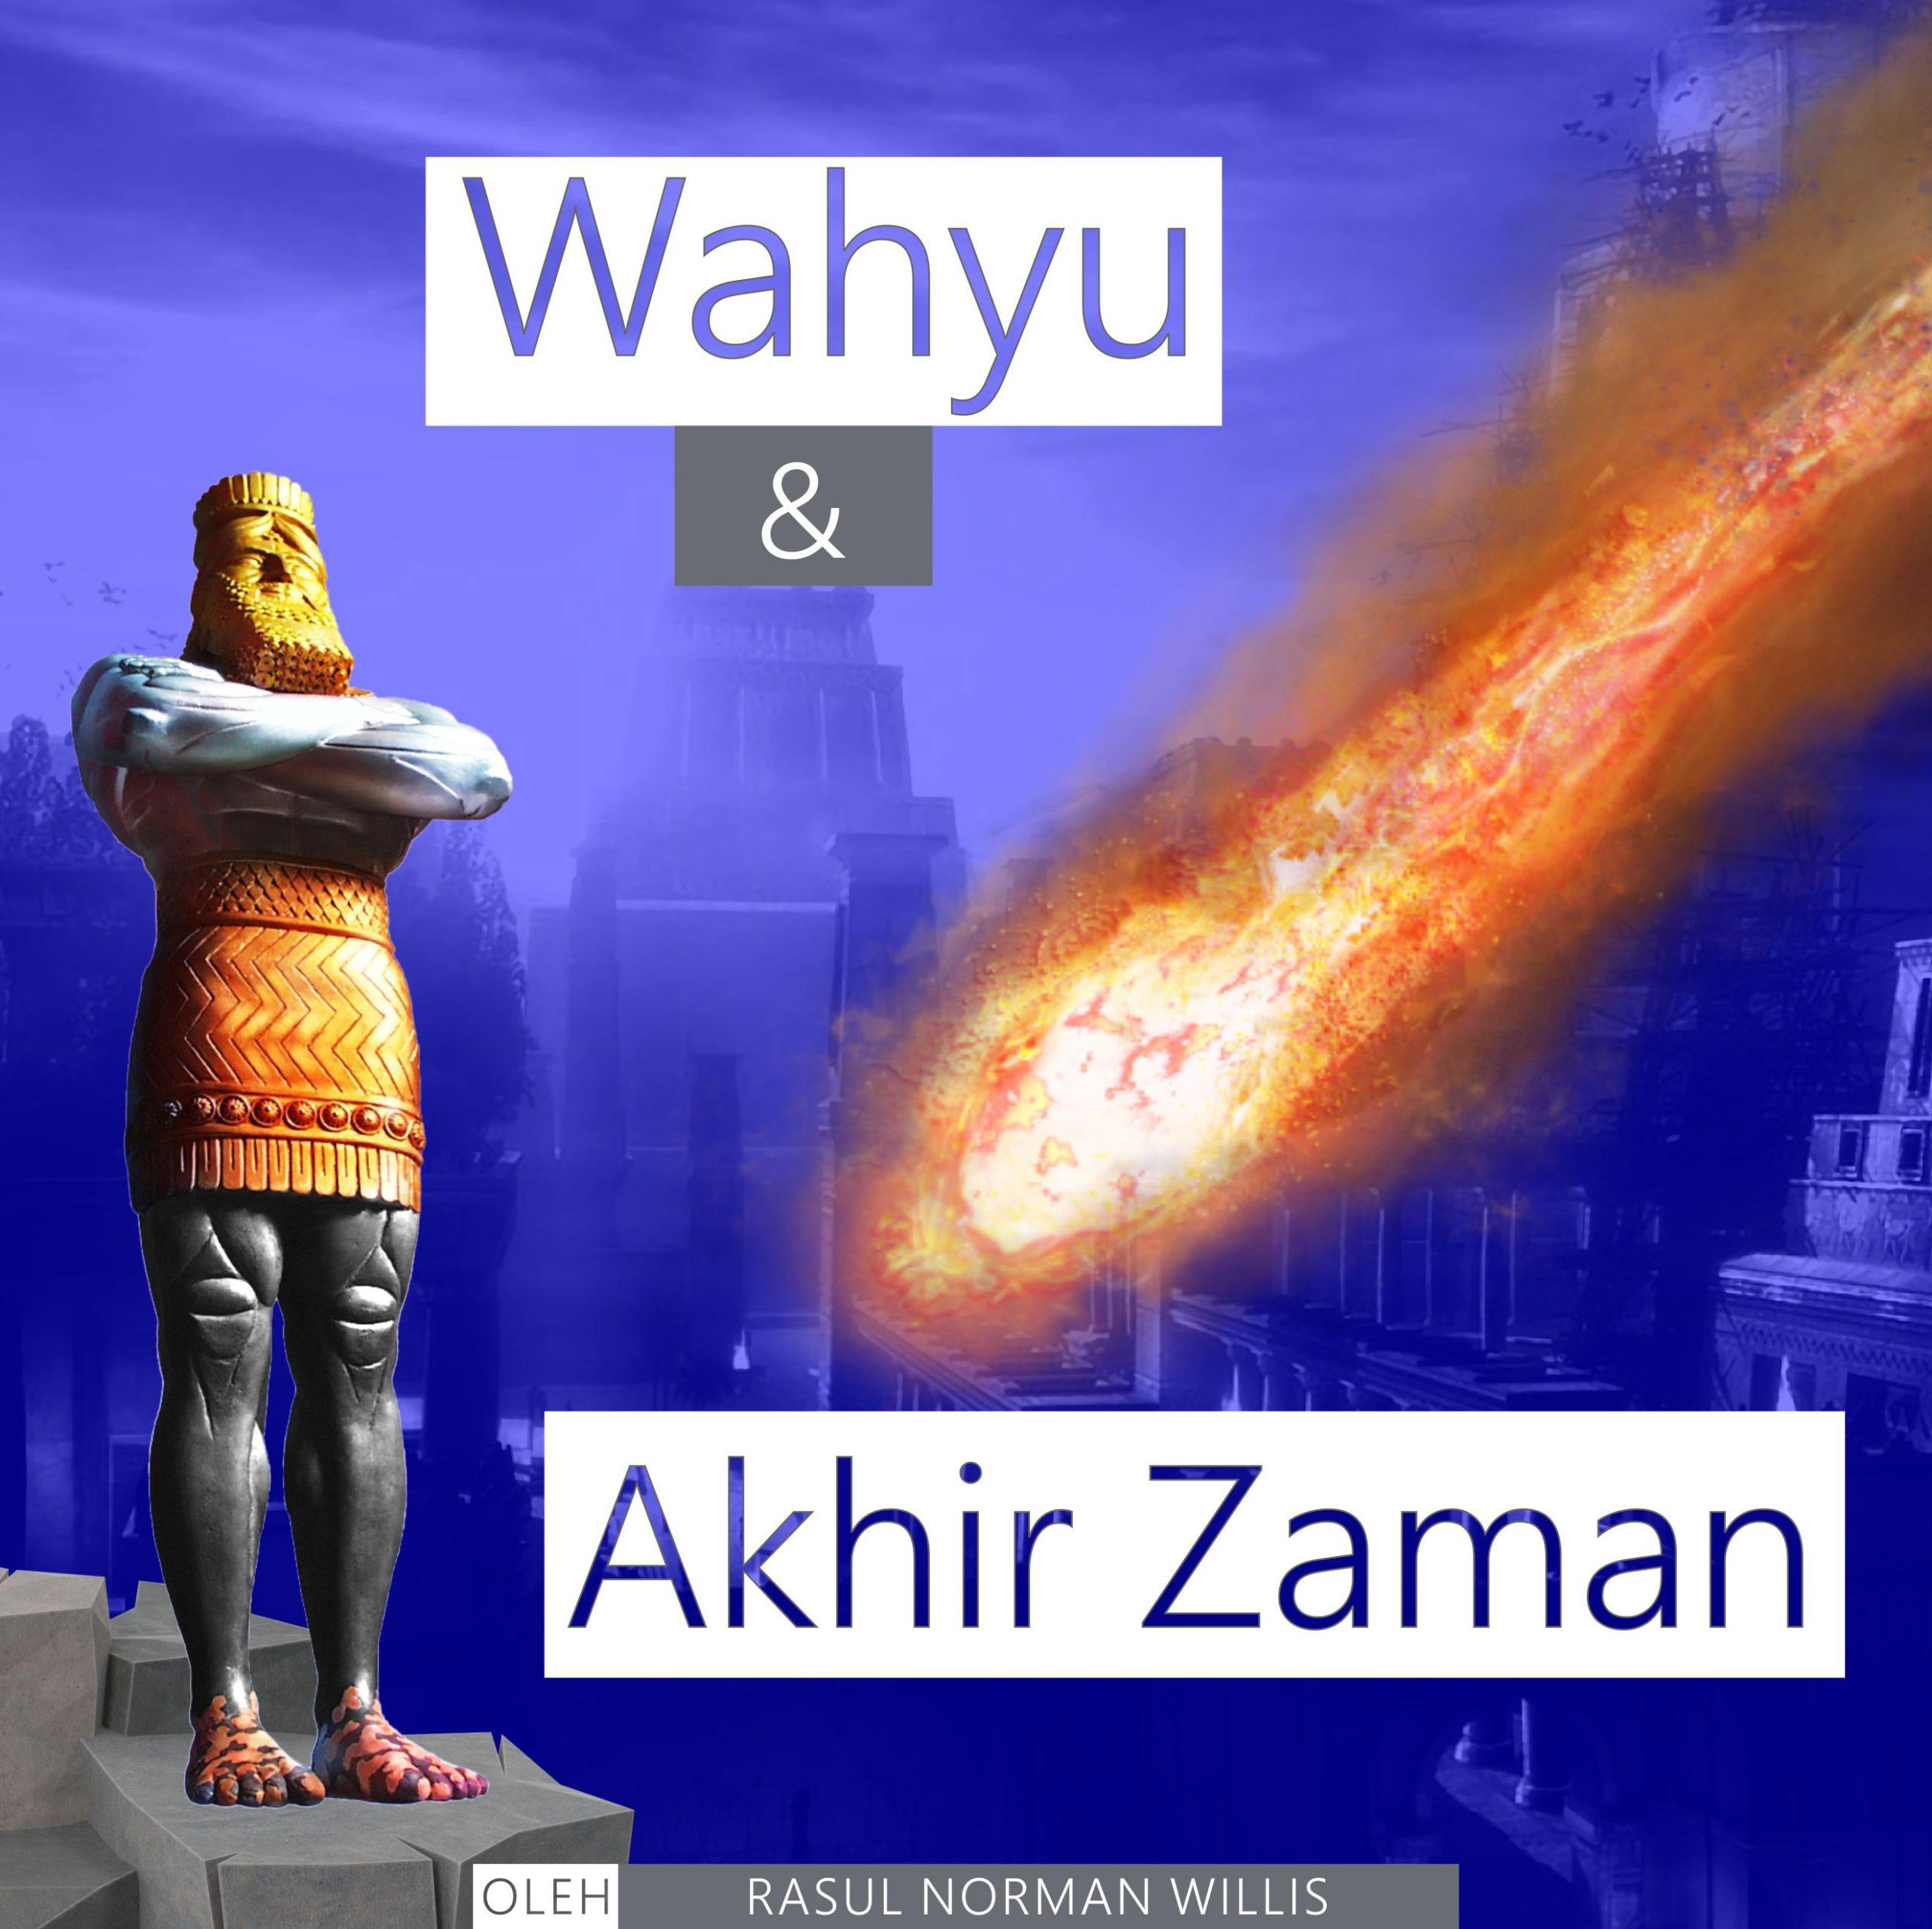 Wahyu & Akhir Zaman